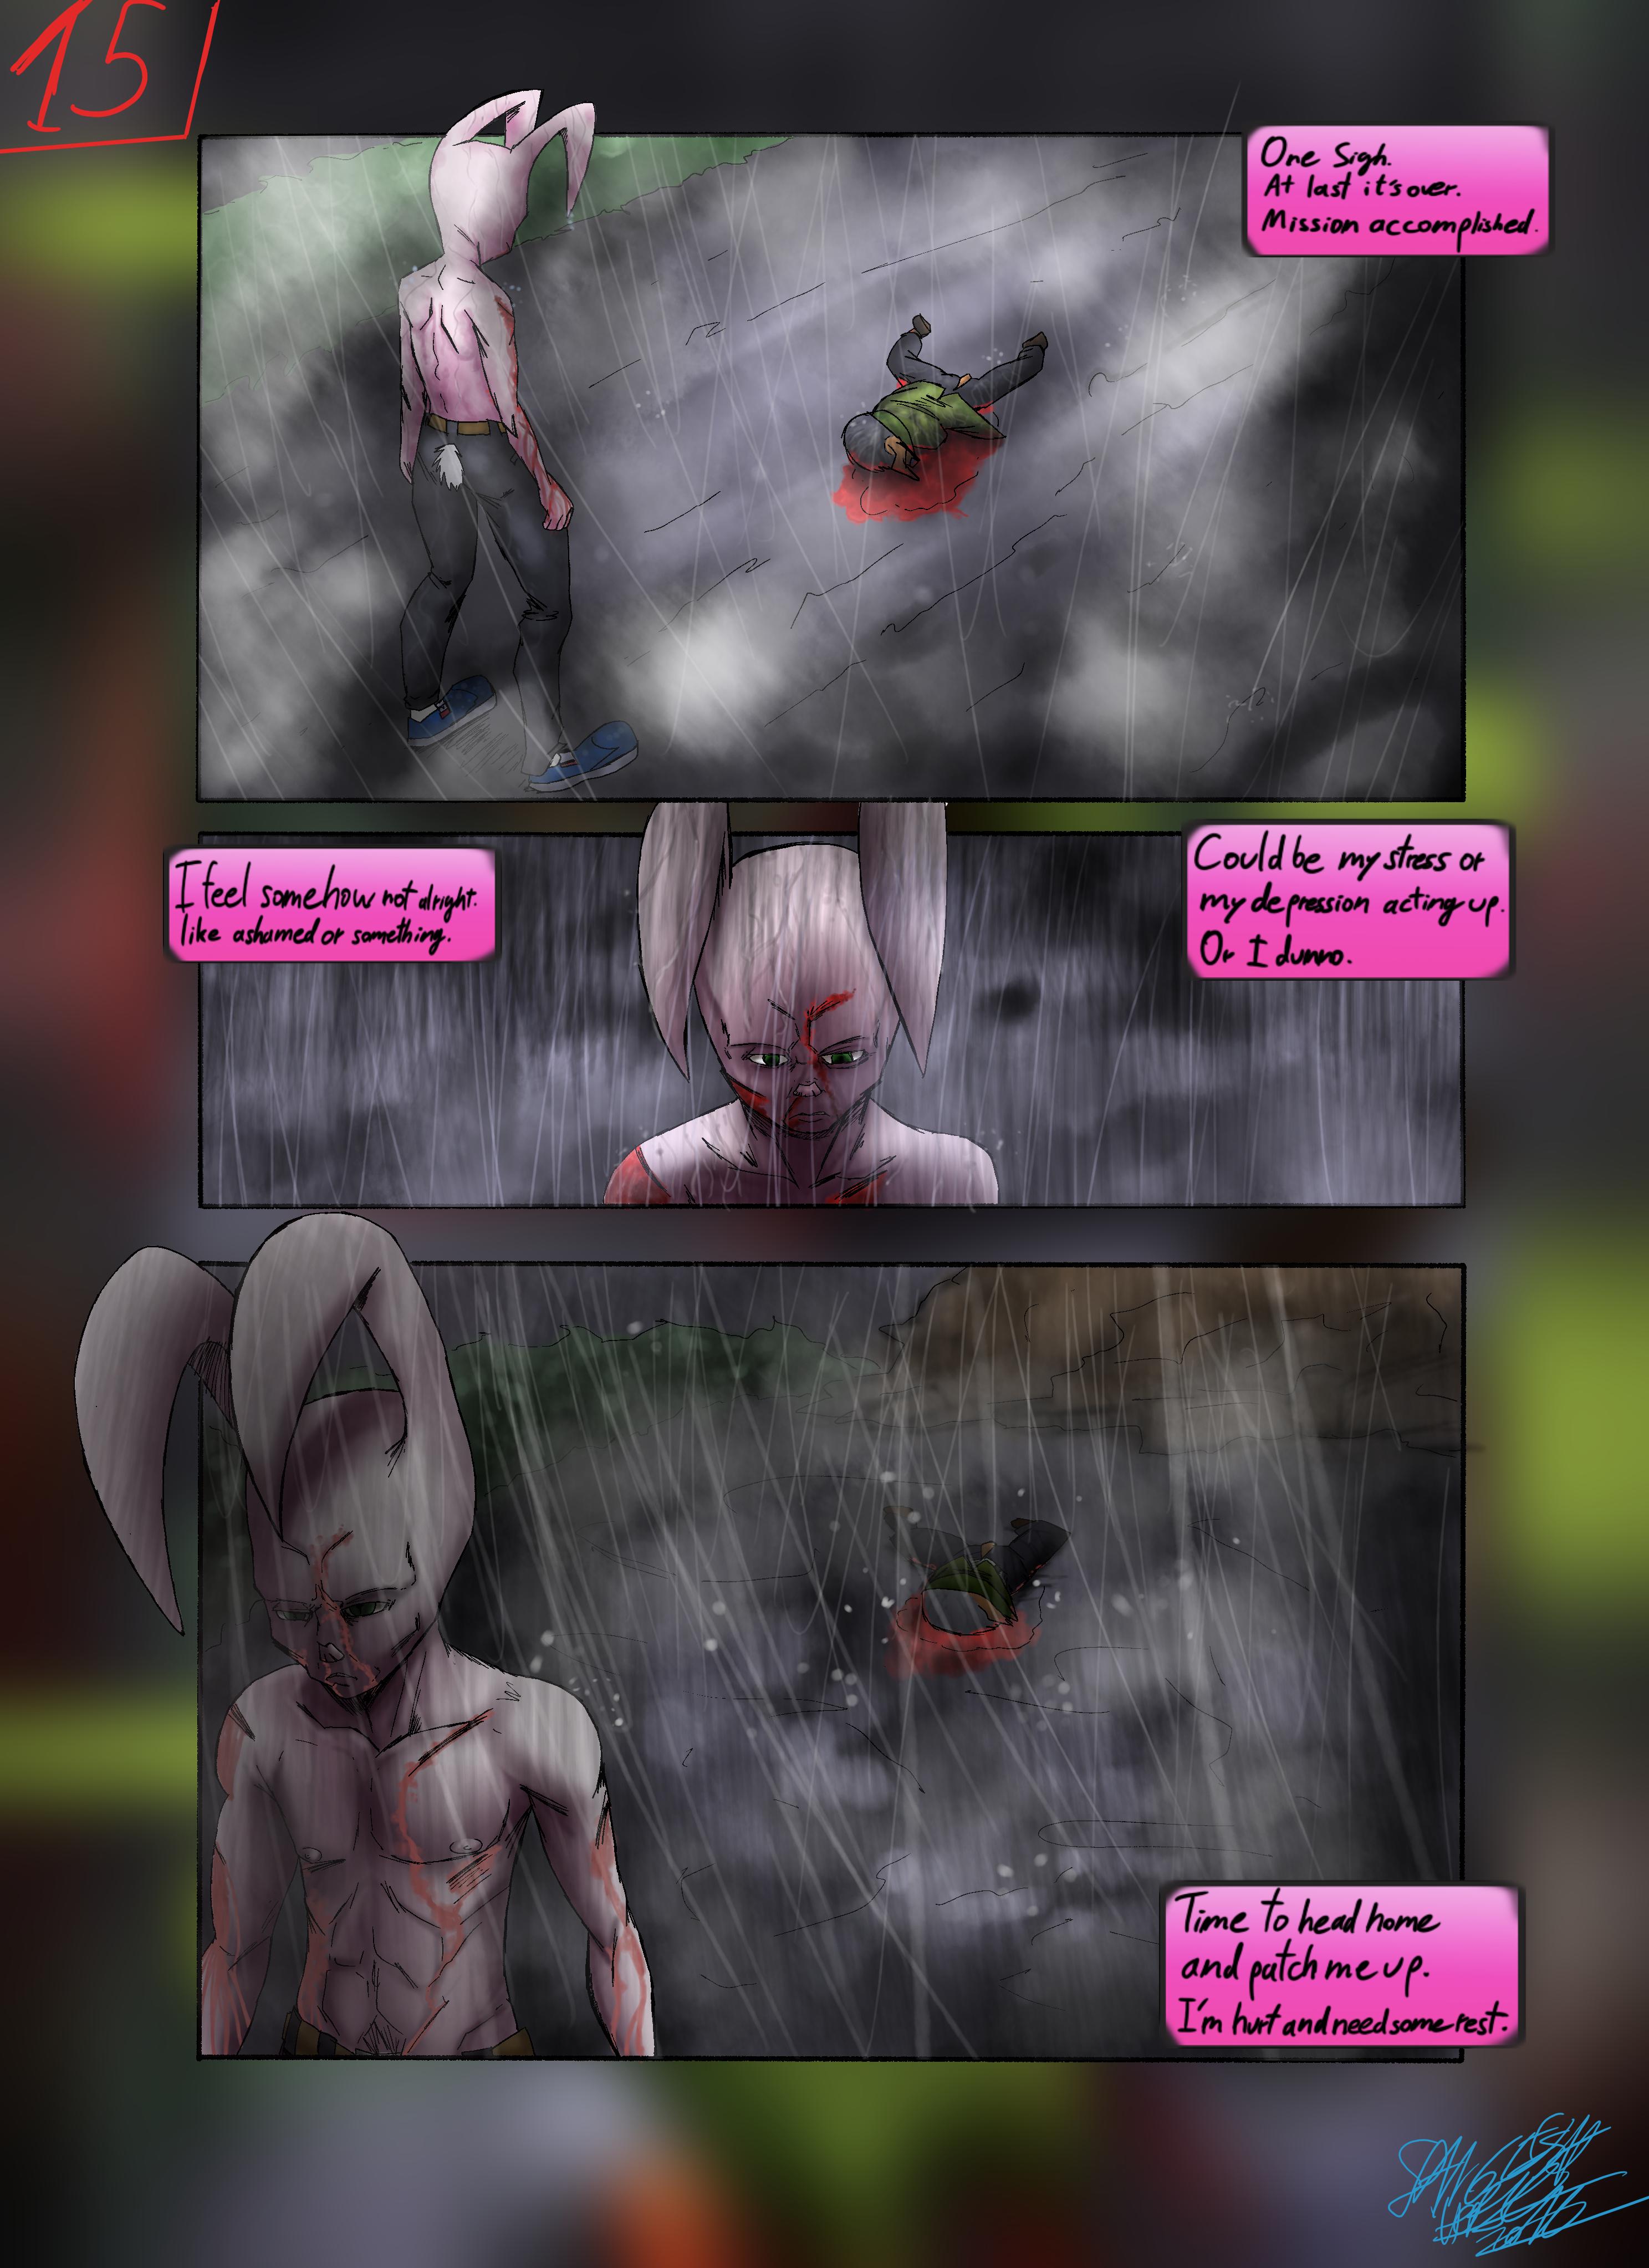 Bob the Psycho Rabbit Vs Alfred Alfer Page 15 (comic) (15/39)